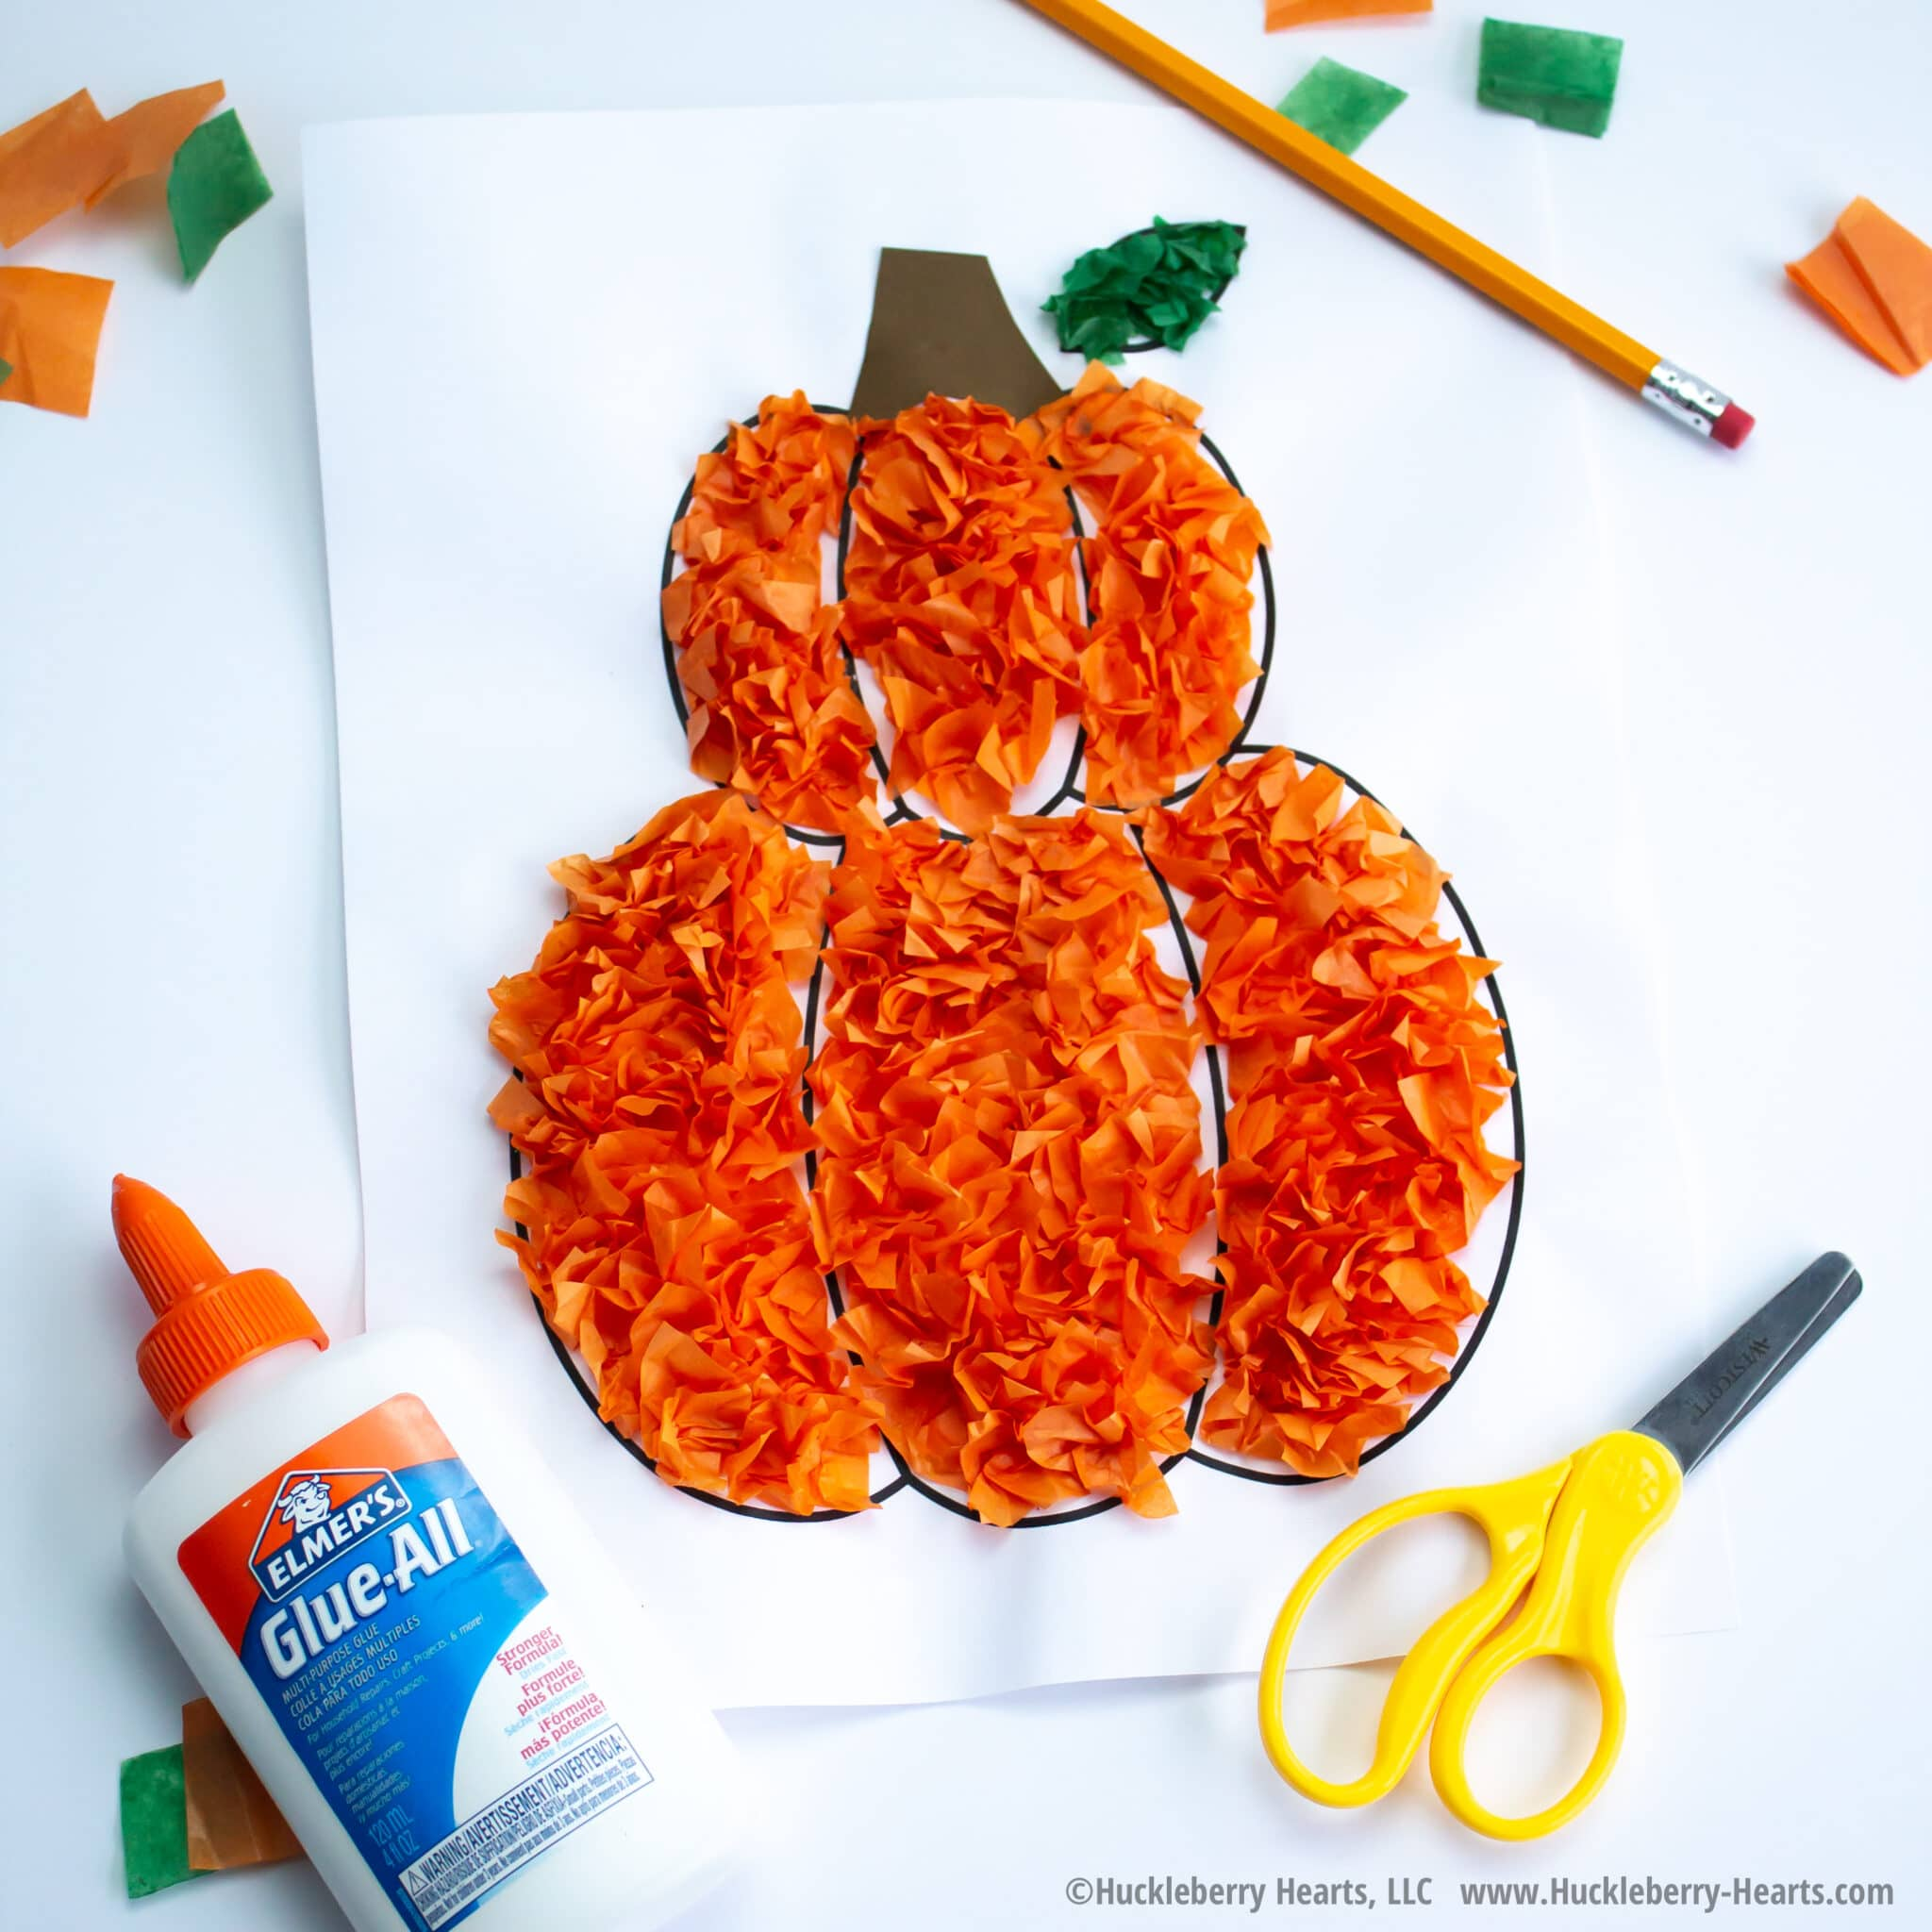 Tissue Paper Crafts for Preschoolers